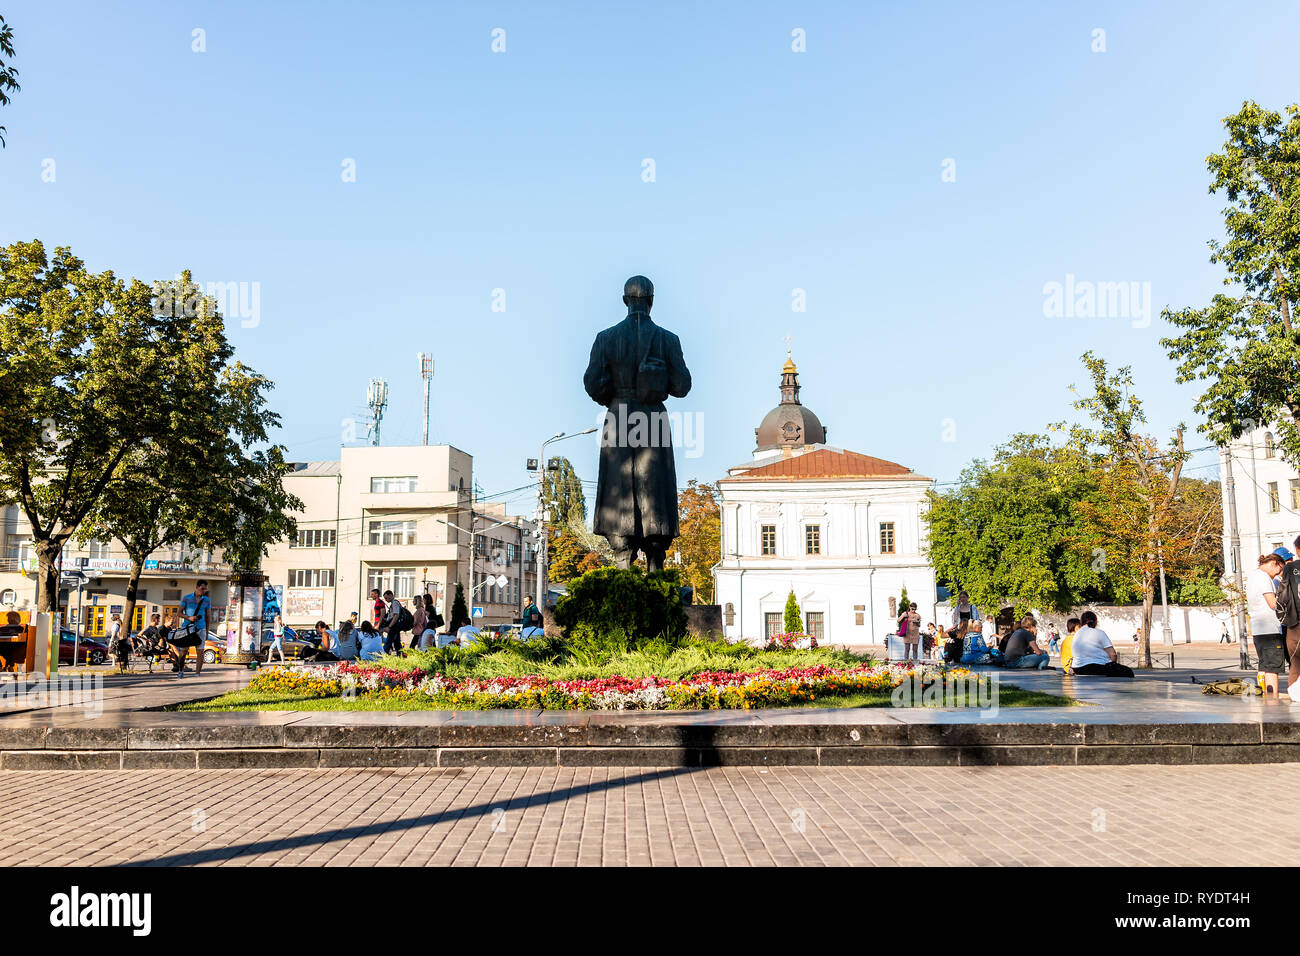 Kyiv, Ukraine - August 10, 2018: Sunny day in Kiev with Kontraktova Square park and people sitting on Skovoroda monument statue in summer outside - Stock Image